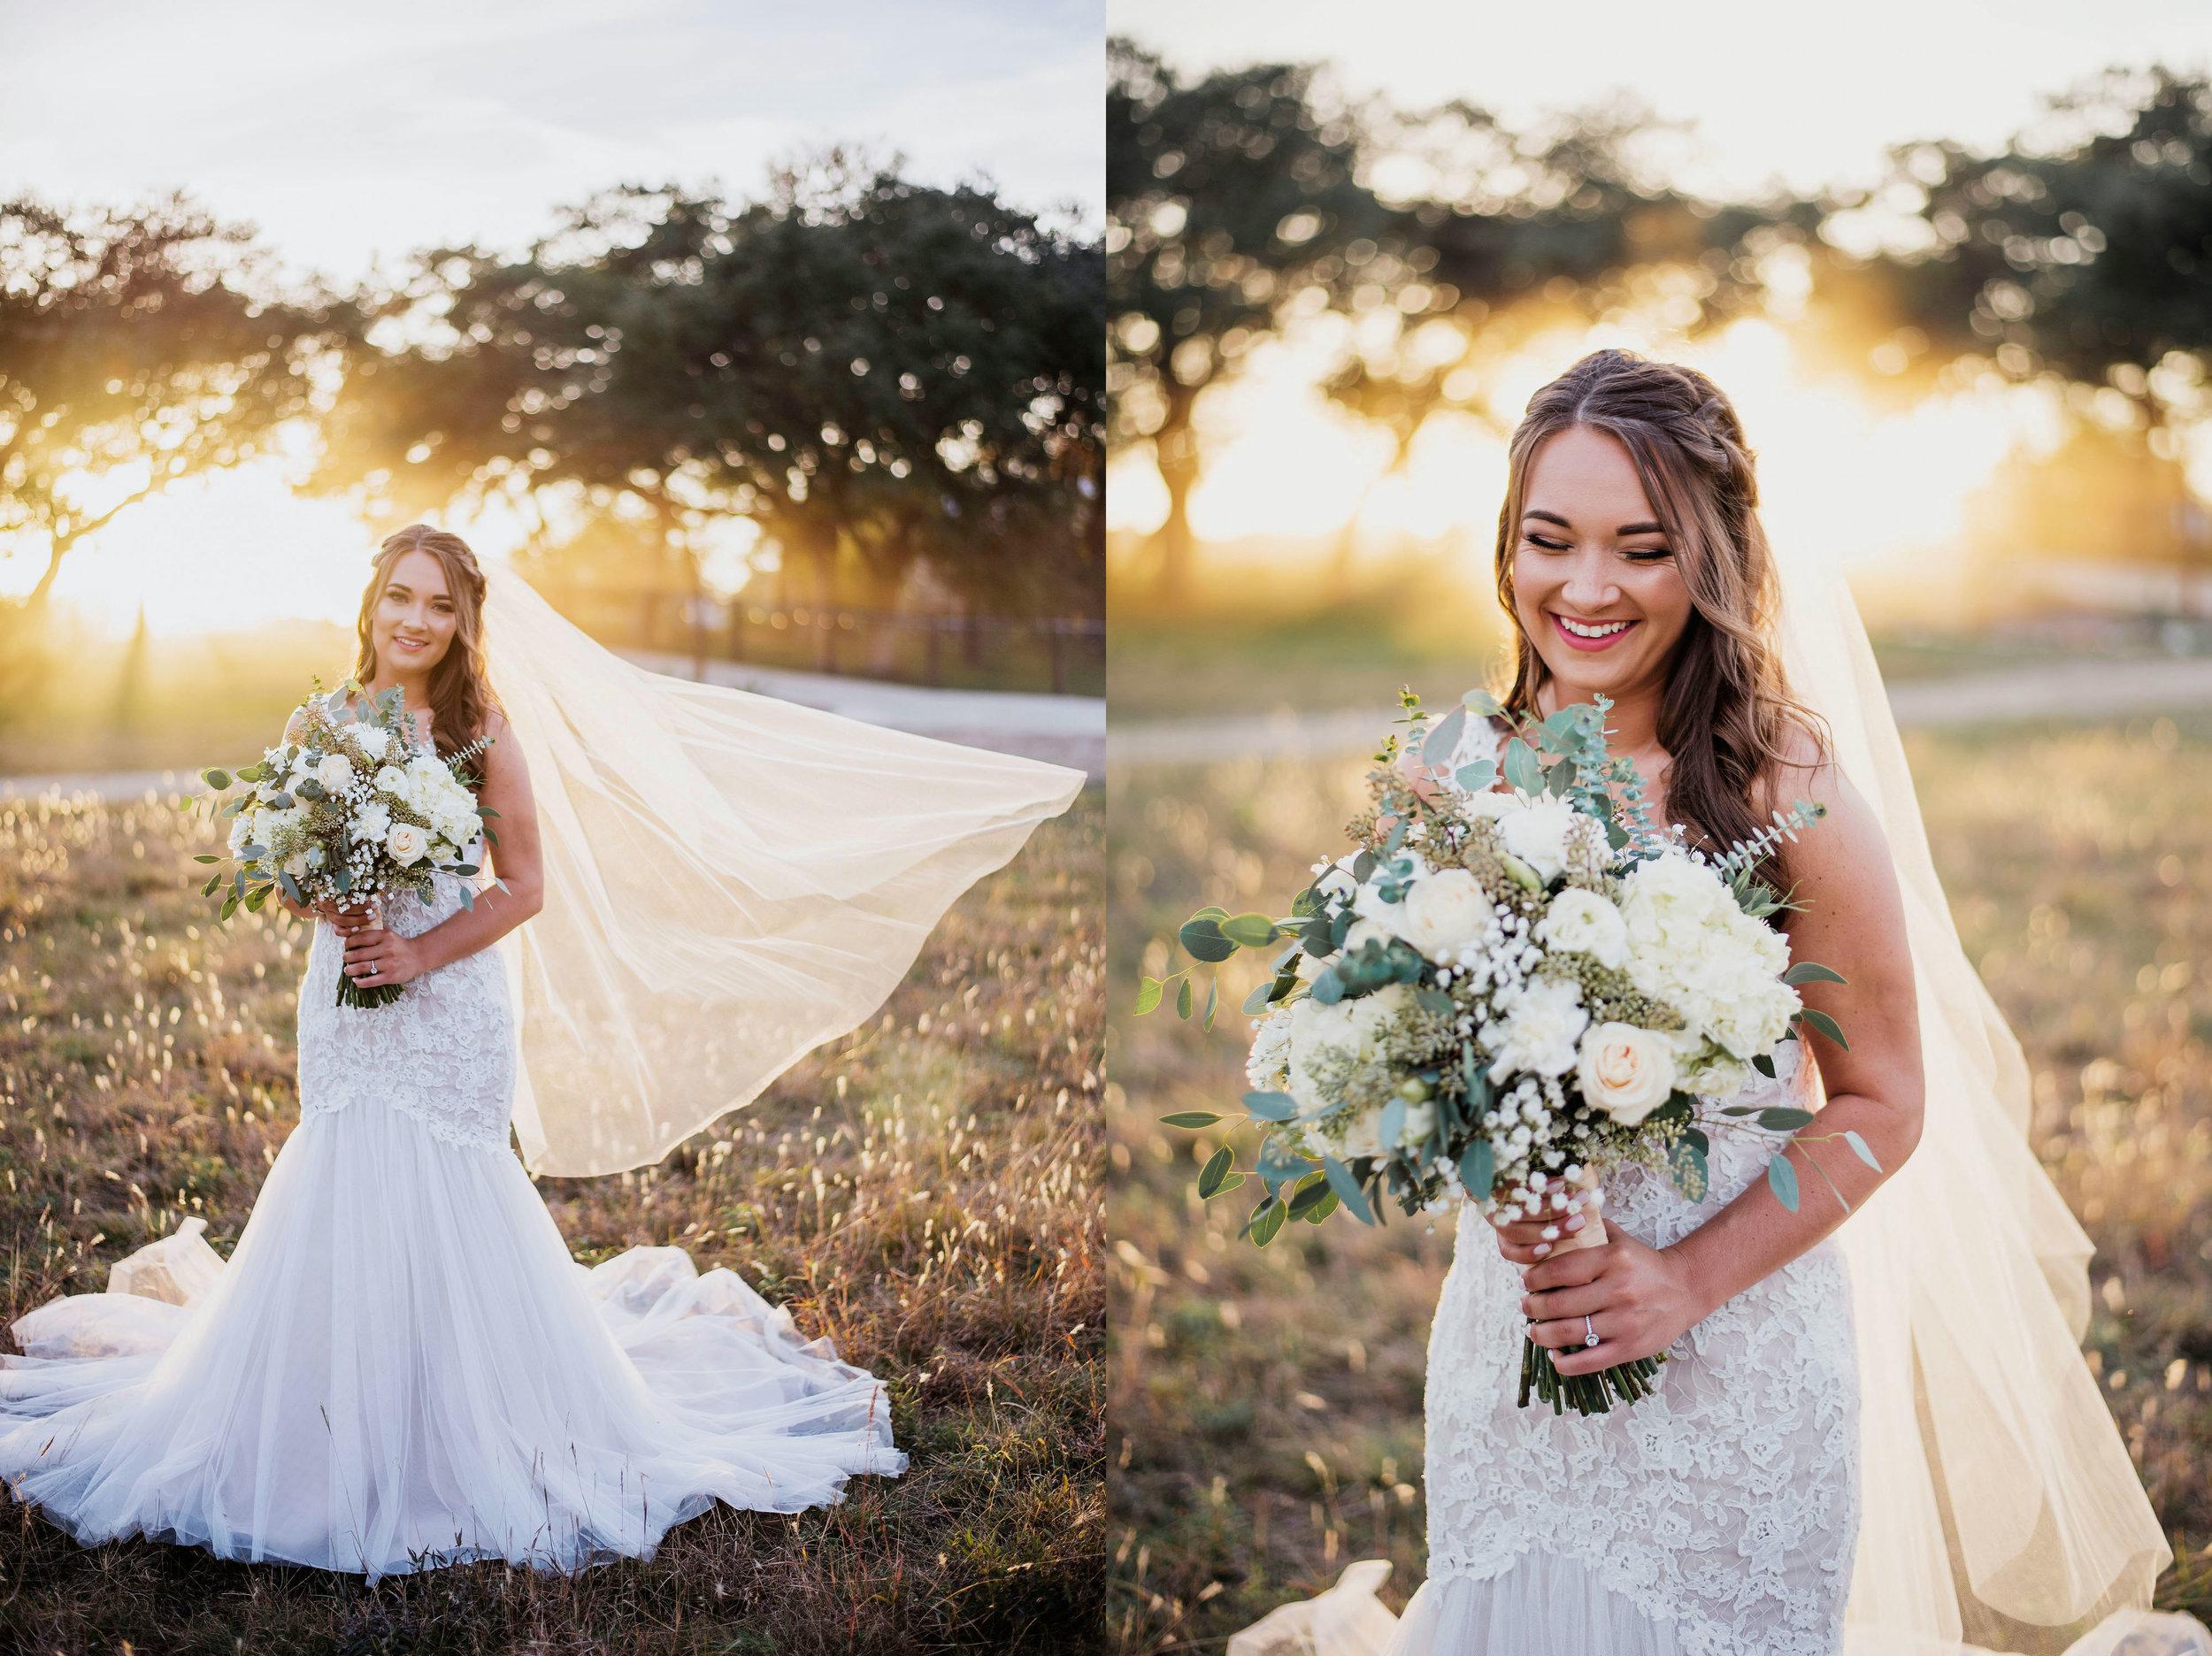 EffJay Photography Destination Wedding Photographer Austin TX Bridal Session La Estancia Bella014.jpg